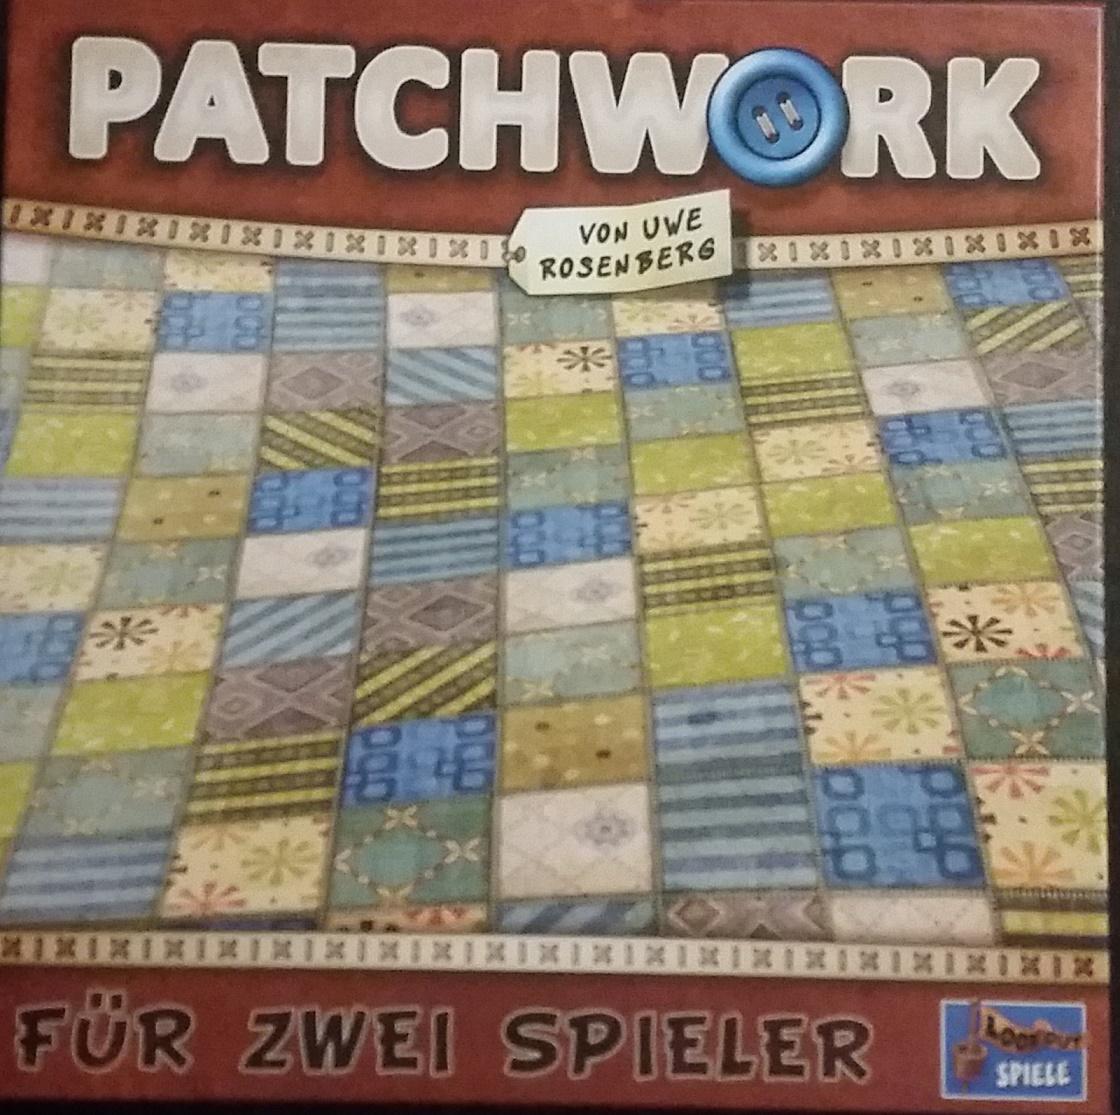 Patchwork (6)